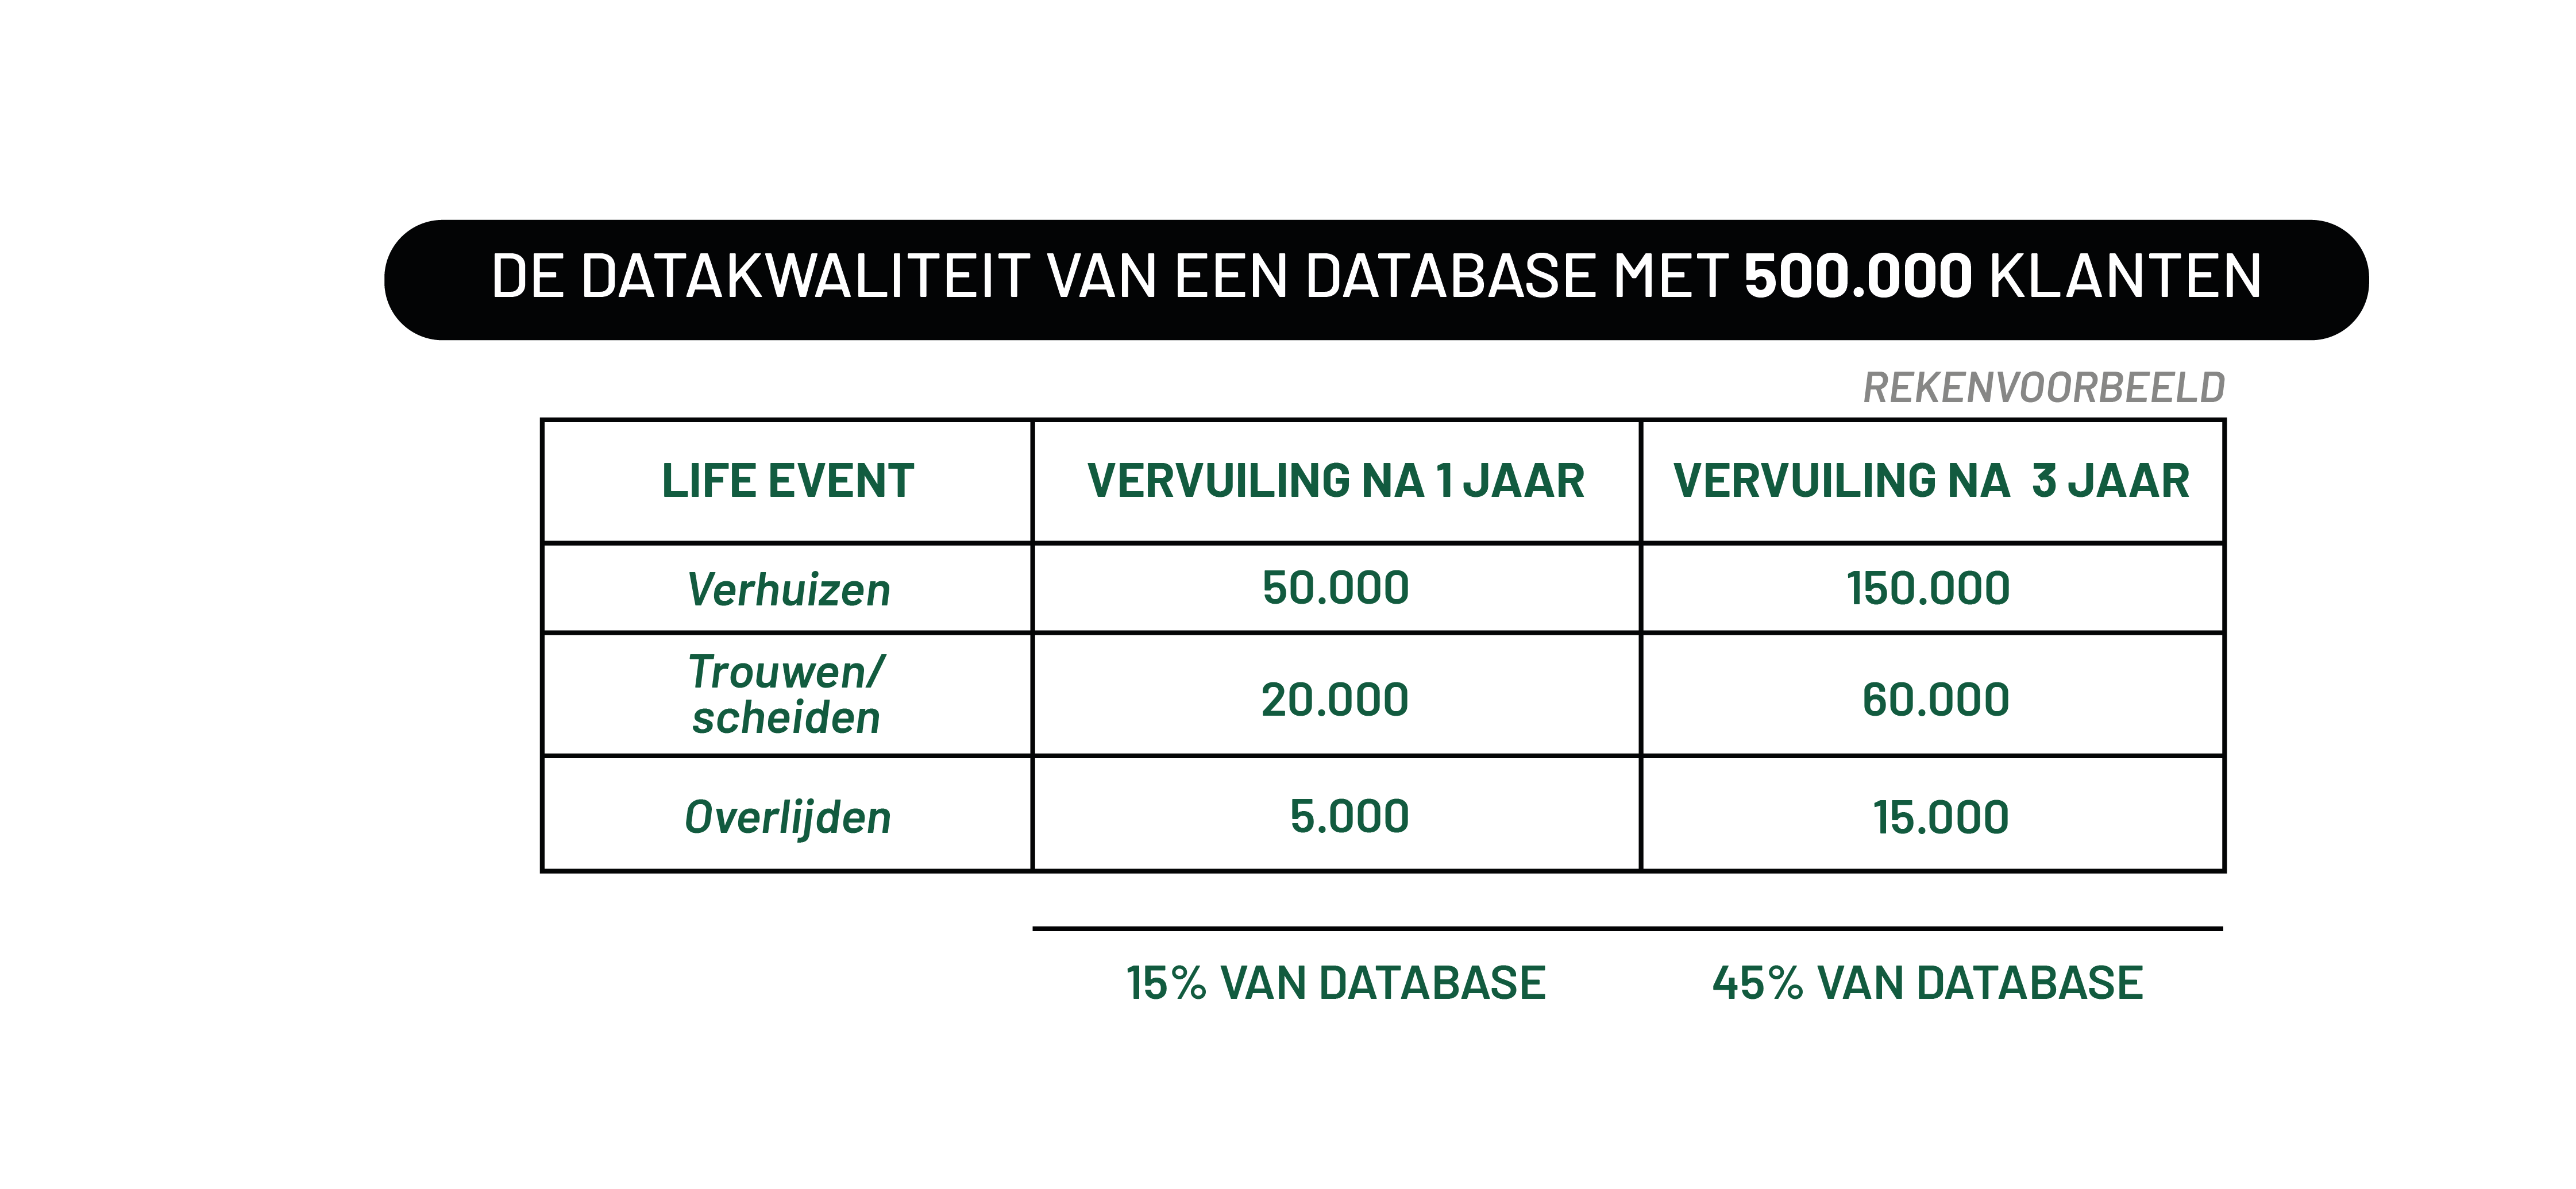 tabel-datakwaliteit-v1.4.1.png